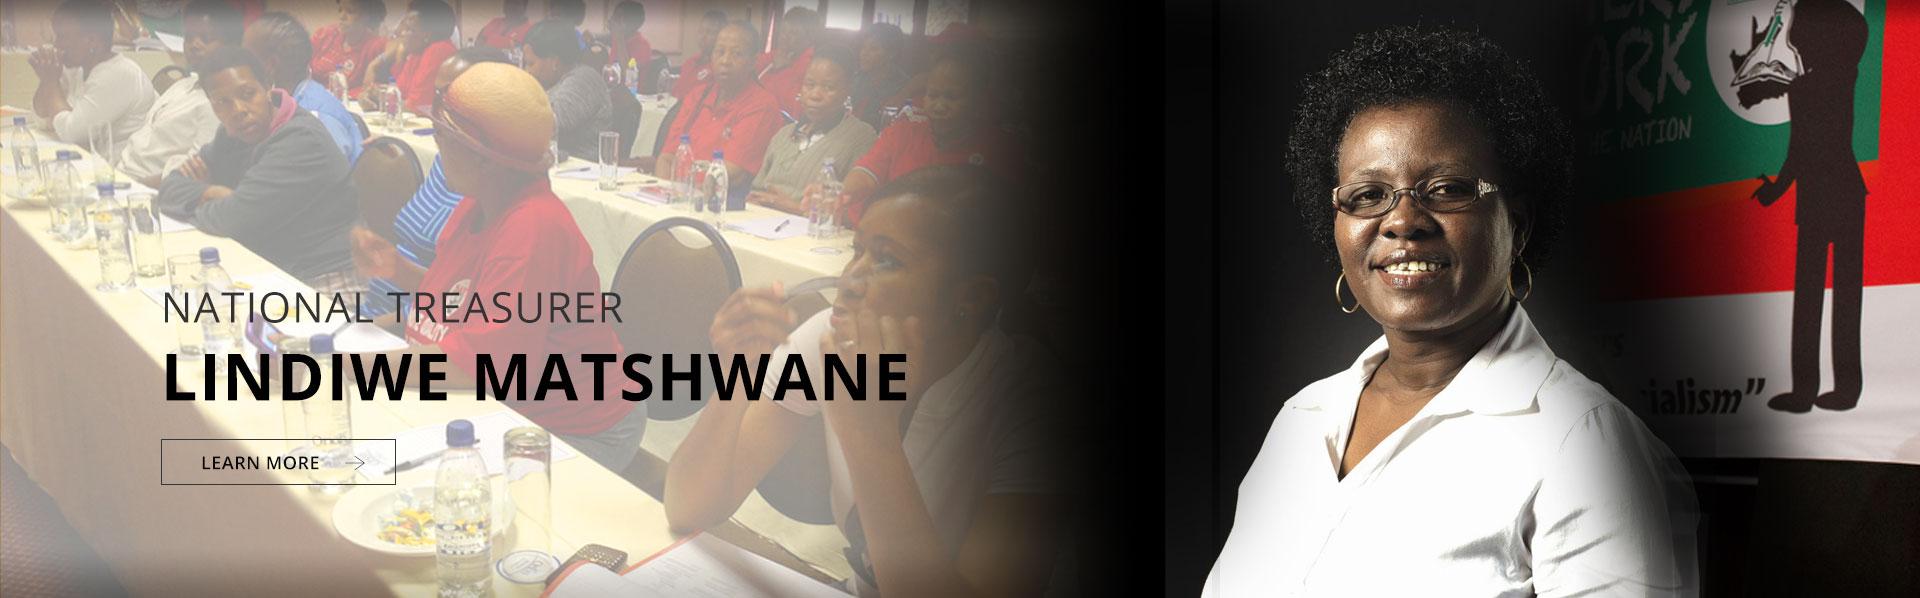 National Treasurer: Cde Lindiwe Matshwane